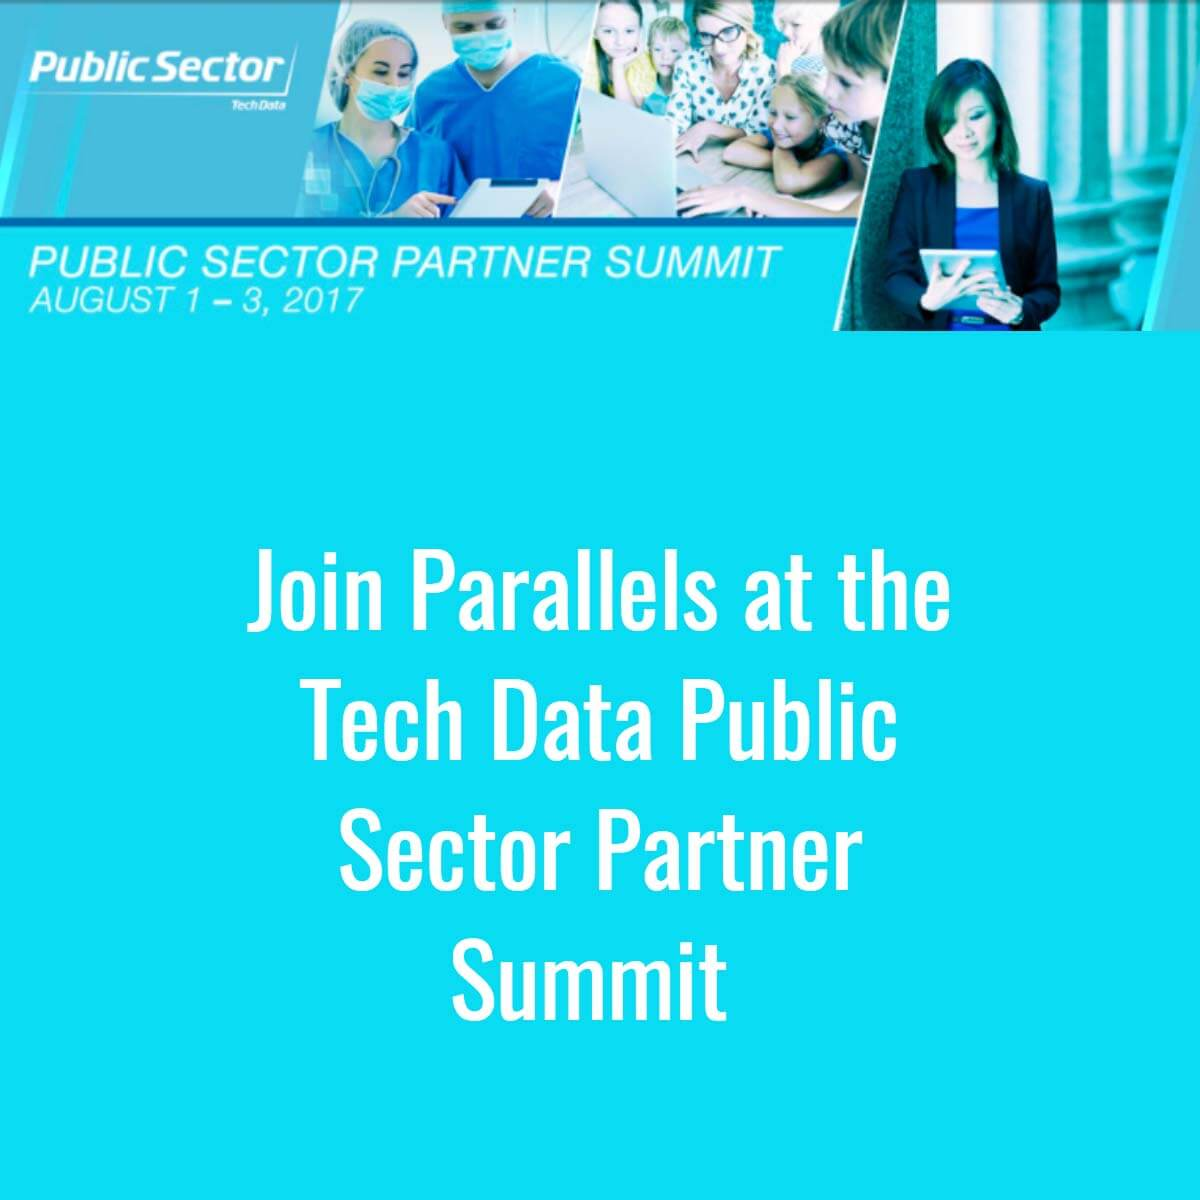 Parallels RAS is Attending Tech Data Public Sector Partner Summit